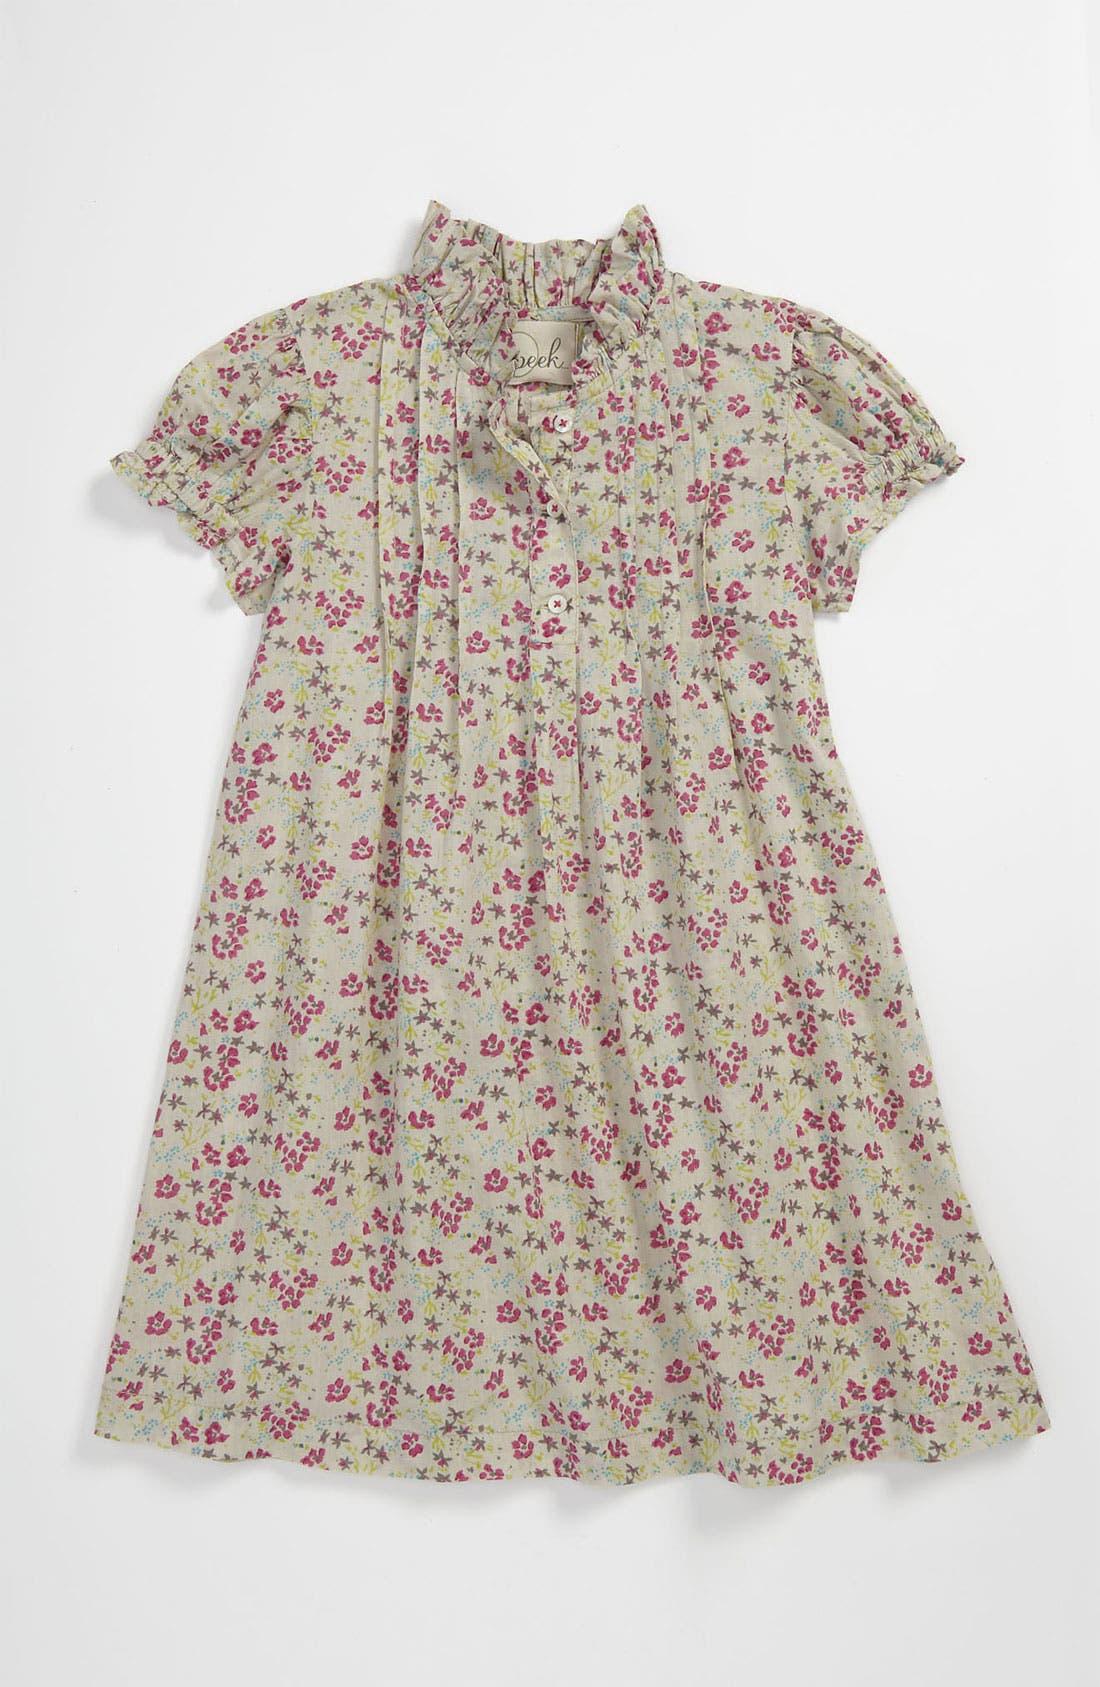 Alternate Image 1 Selected - Peek 'Ella' Dress (Toddler, Little Girls & Big Girls)